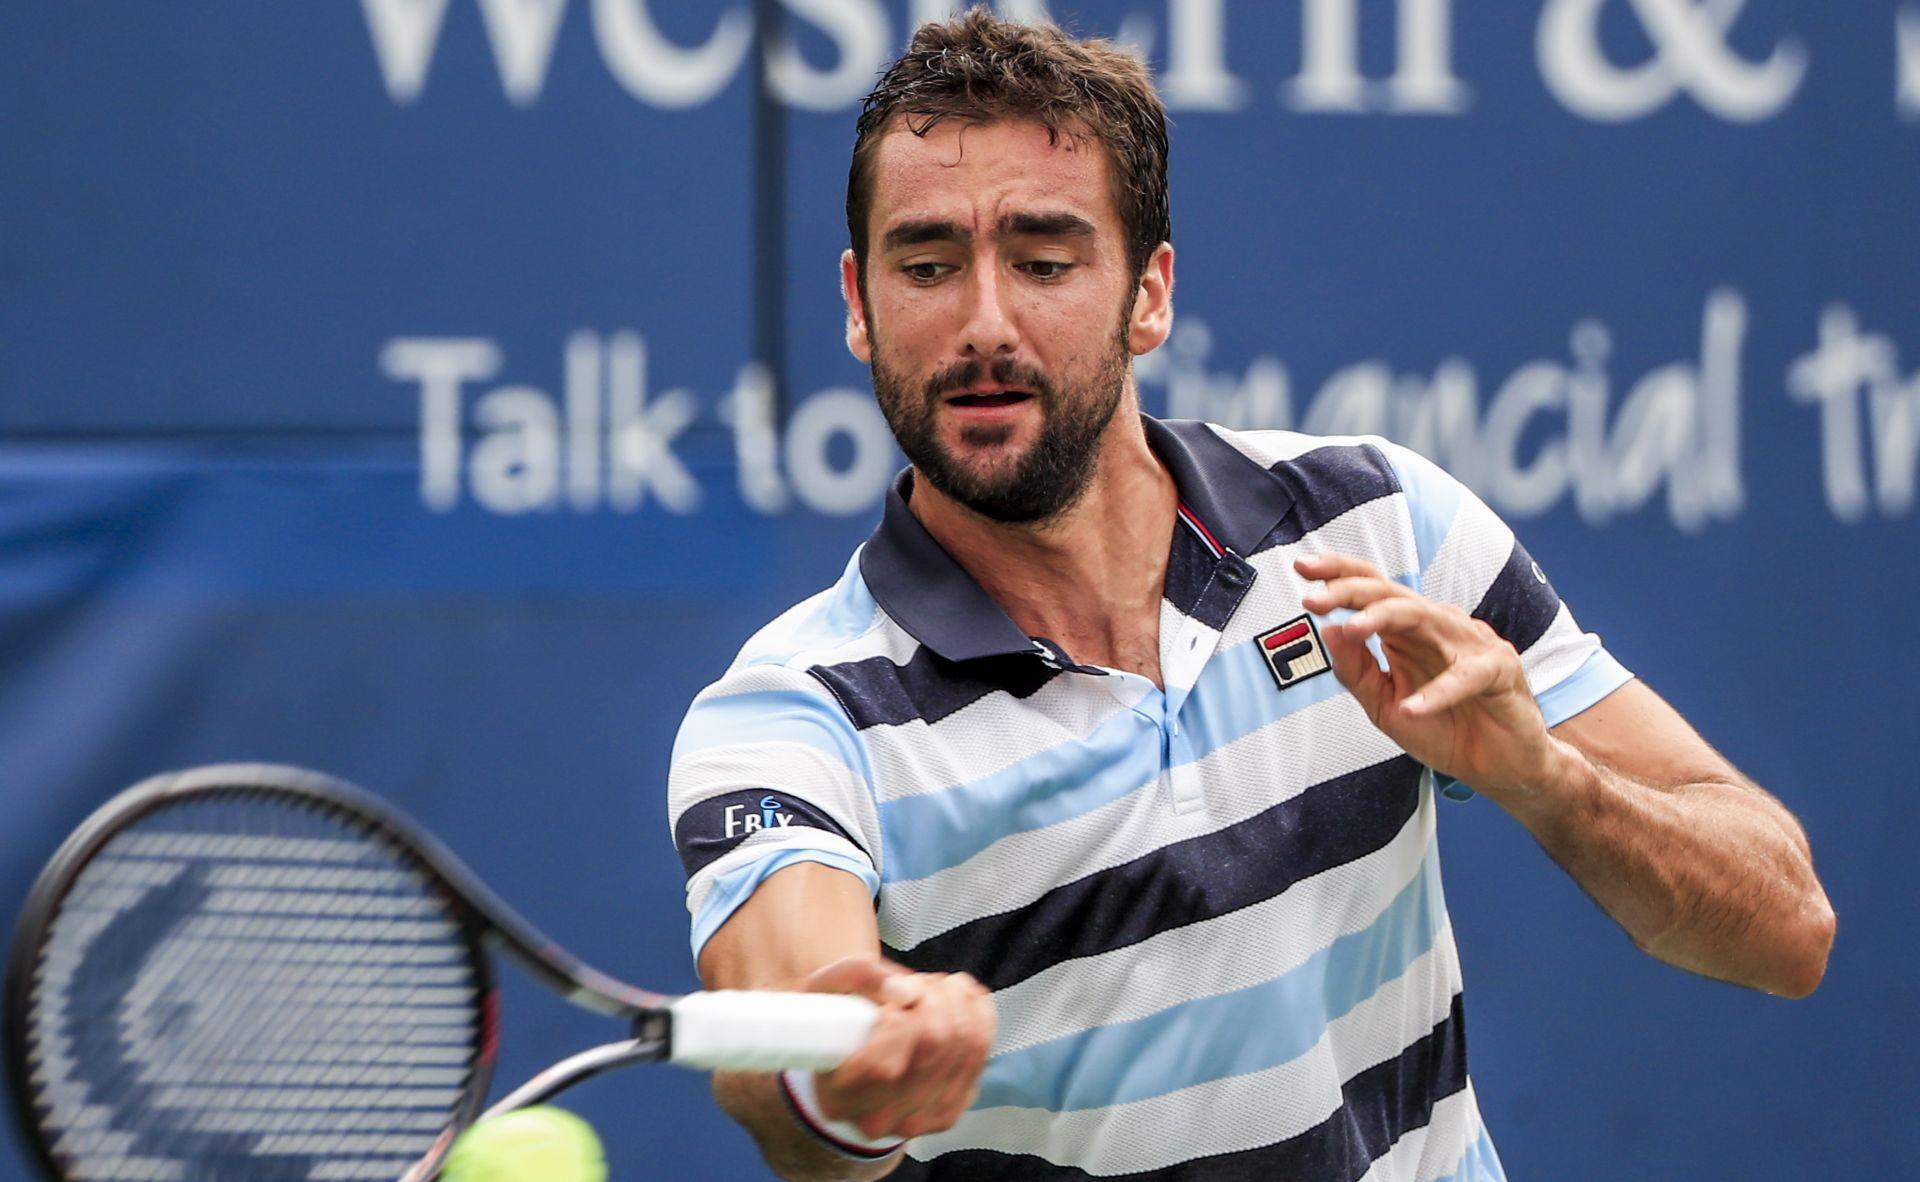 ATP CINCINNATI Čilić u polufinalu protiv Đokovića